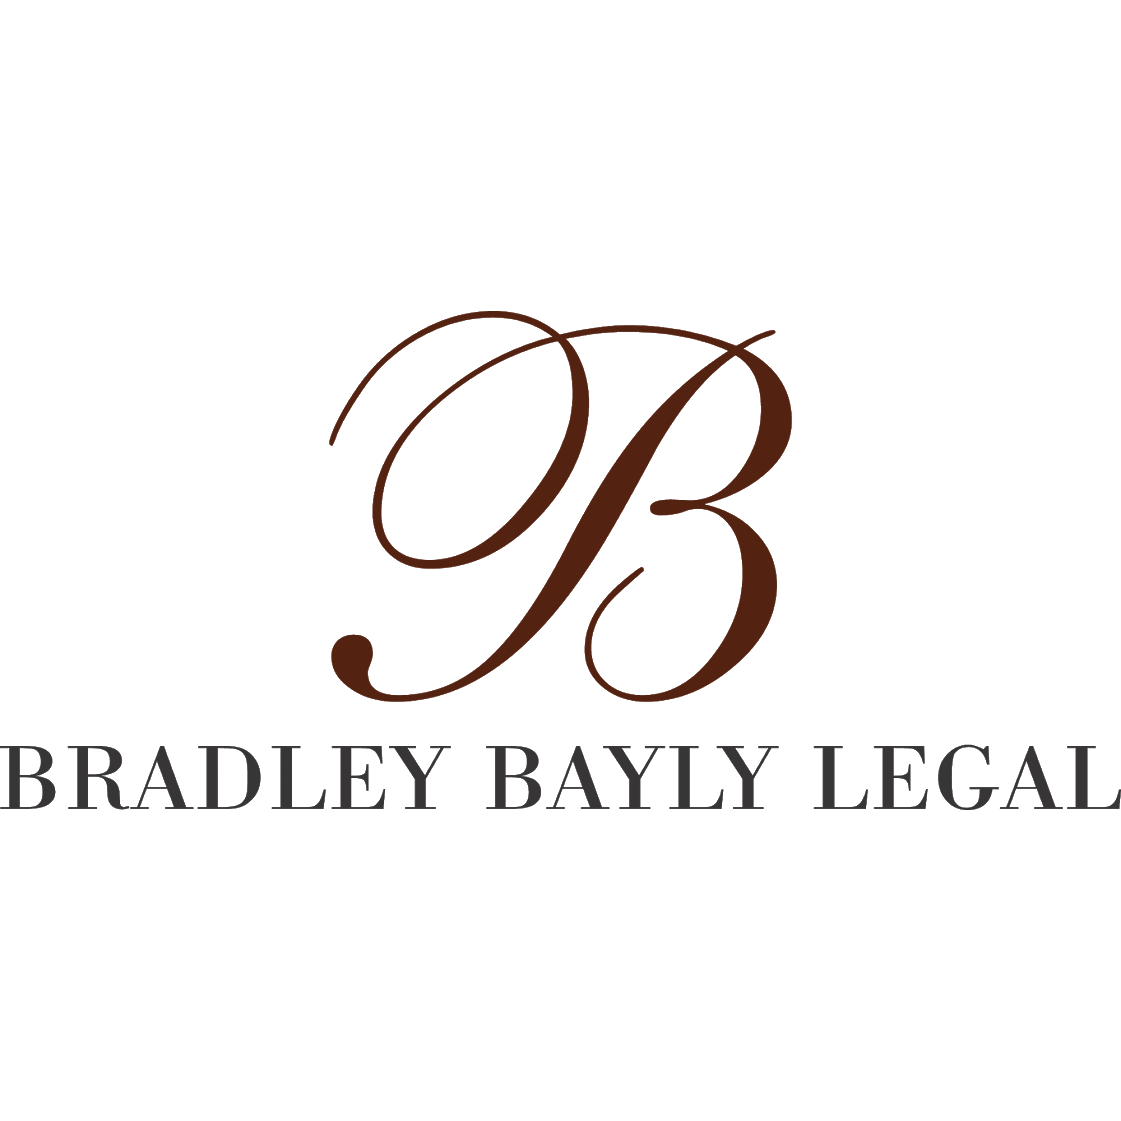 Bradley Bayly Legal